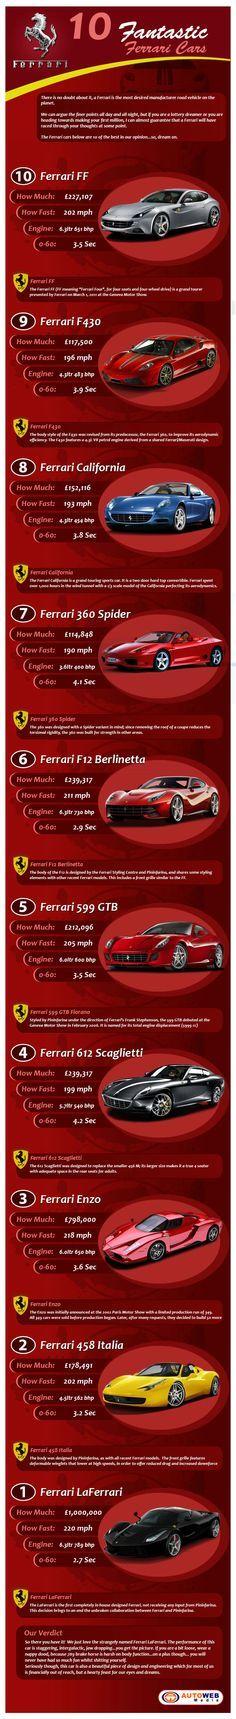 Ferrari Production Cars 10 Greatest Ferrari Production Cars of All Time | BrandonGaille.com